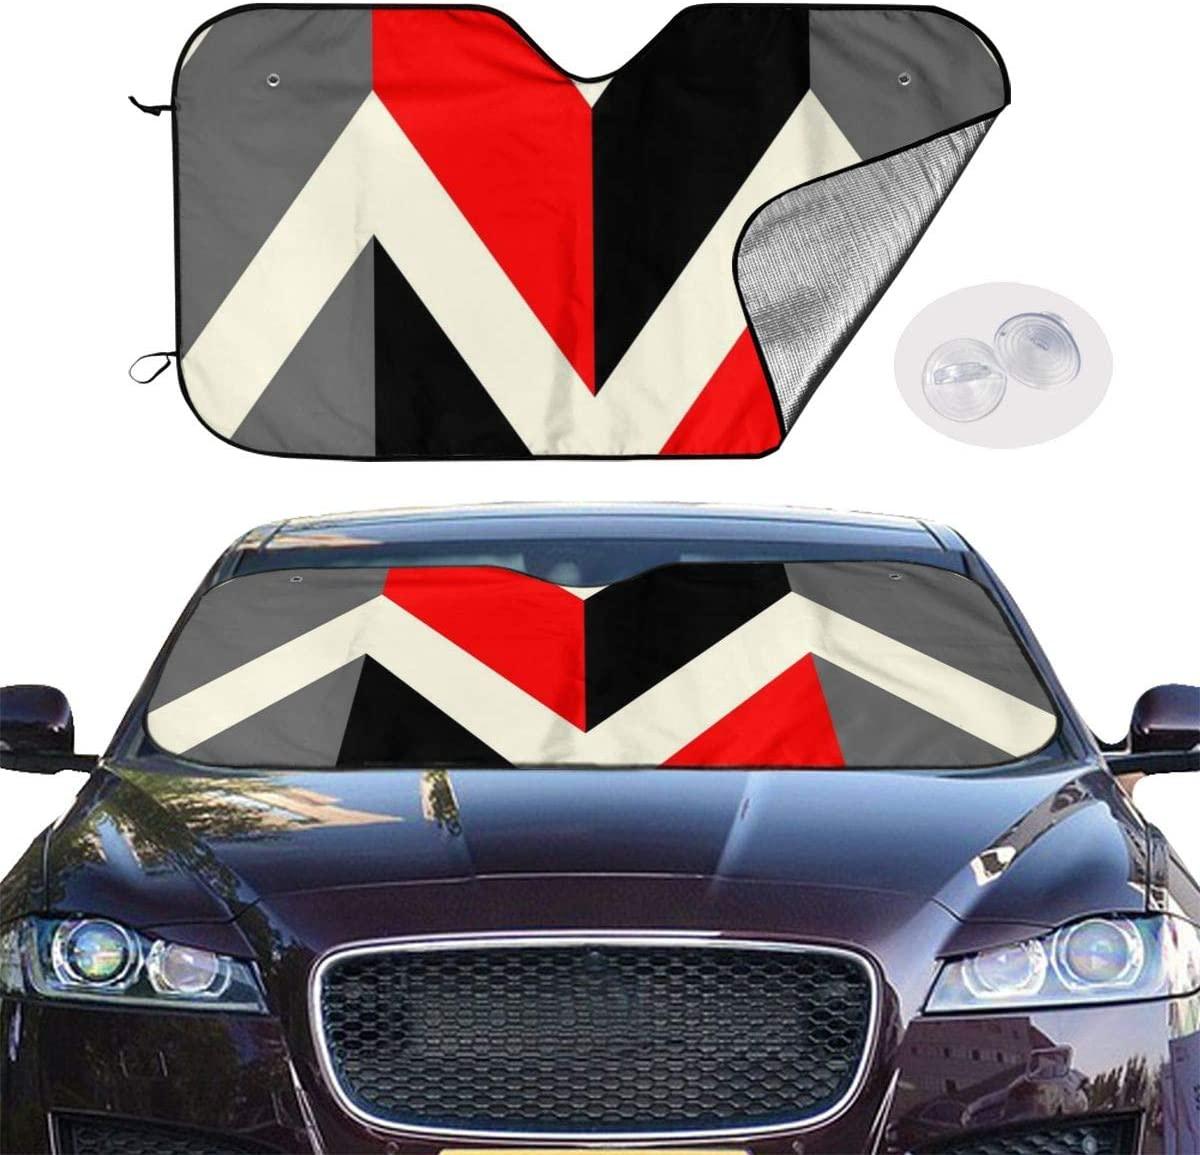 THONFIRE Car Windshield Sunshade Red Black Gray Lines Blocks UV Rays Keeps Your Vehicle Cool Visor Protector Automobile Front Window Heatshield